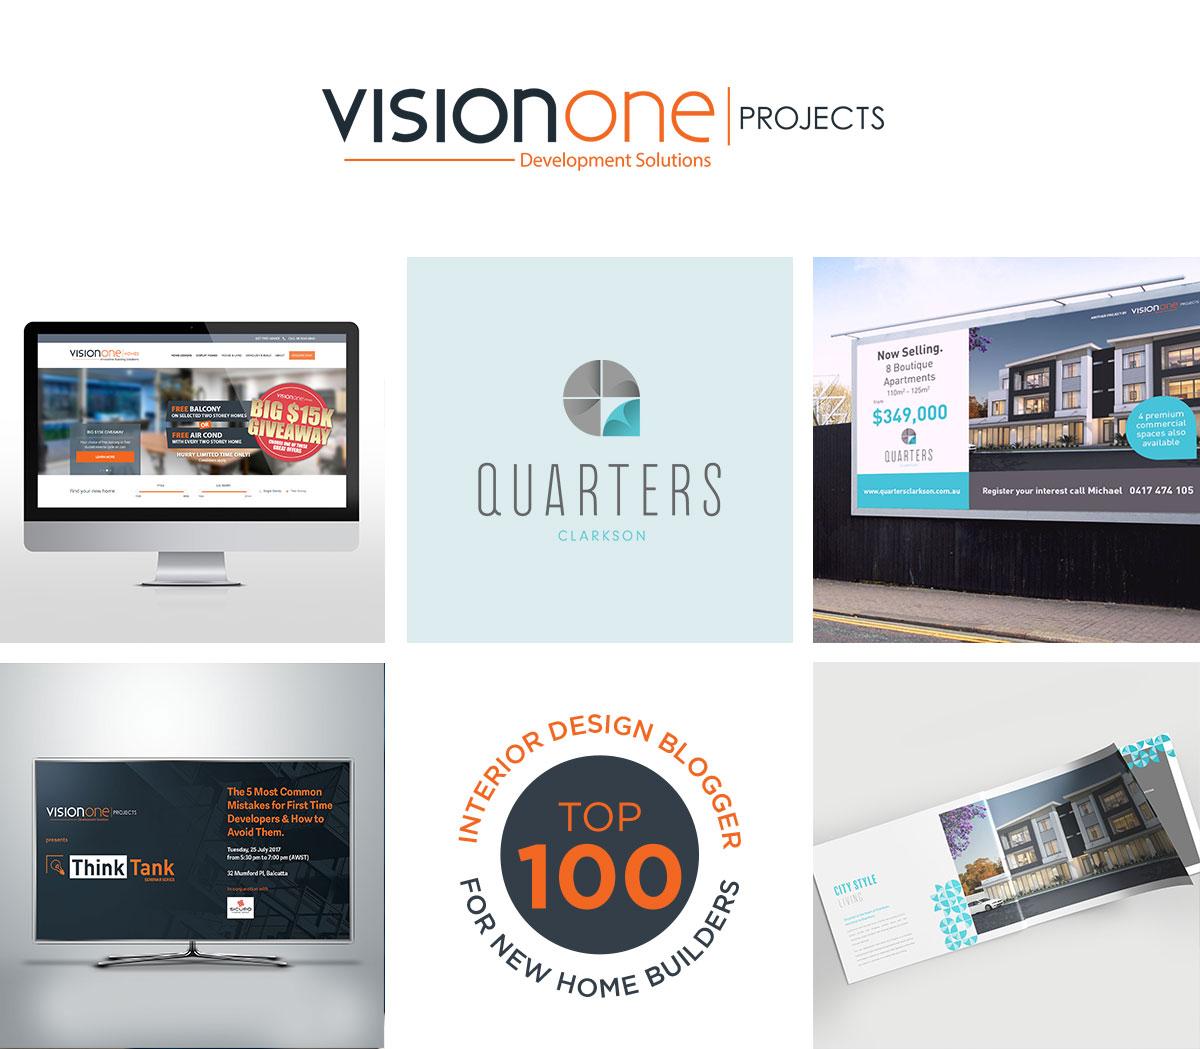 Vision-one.jpg